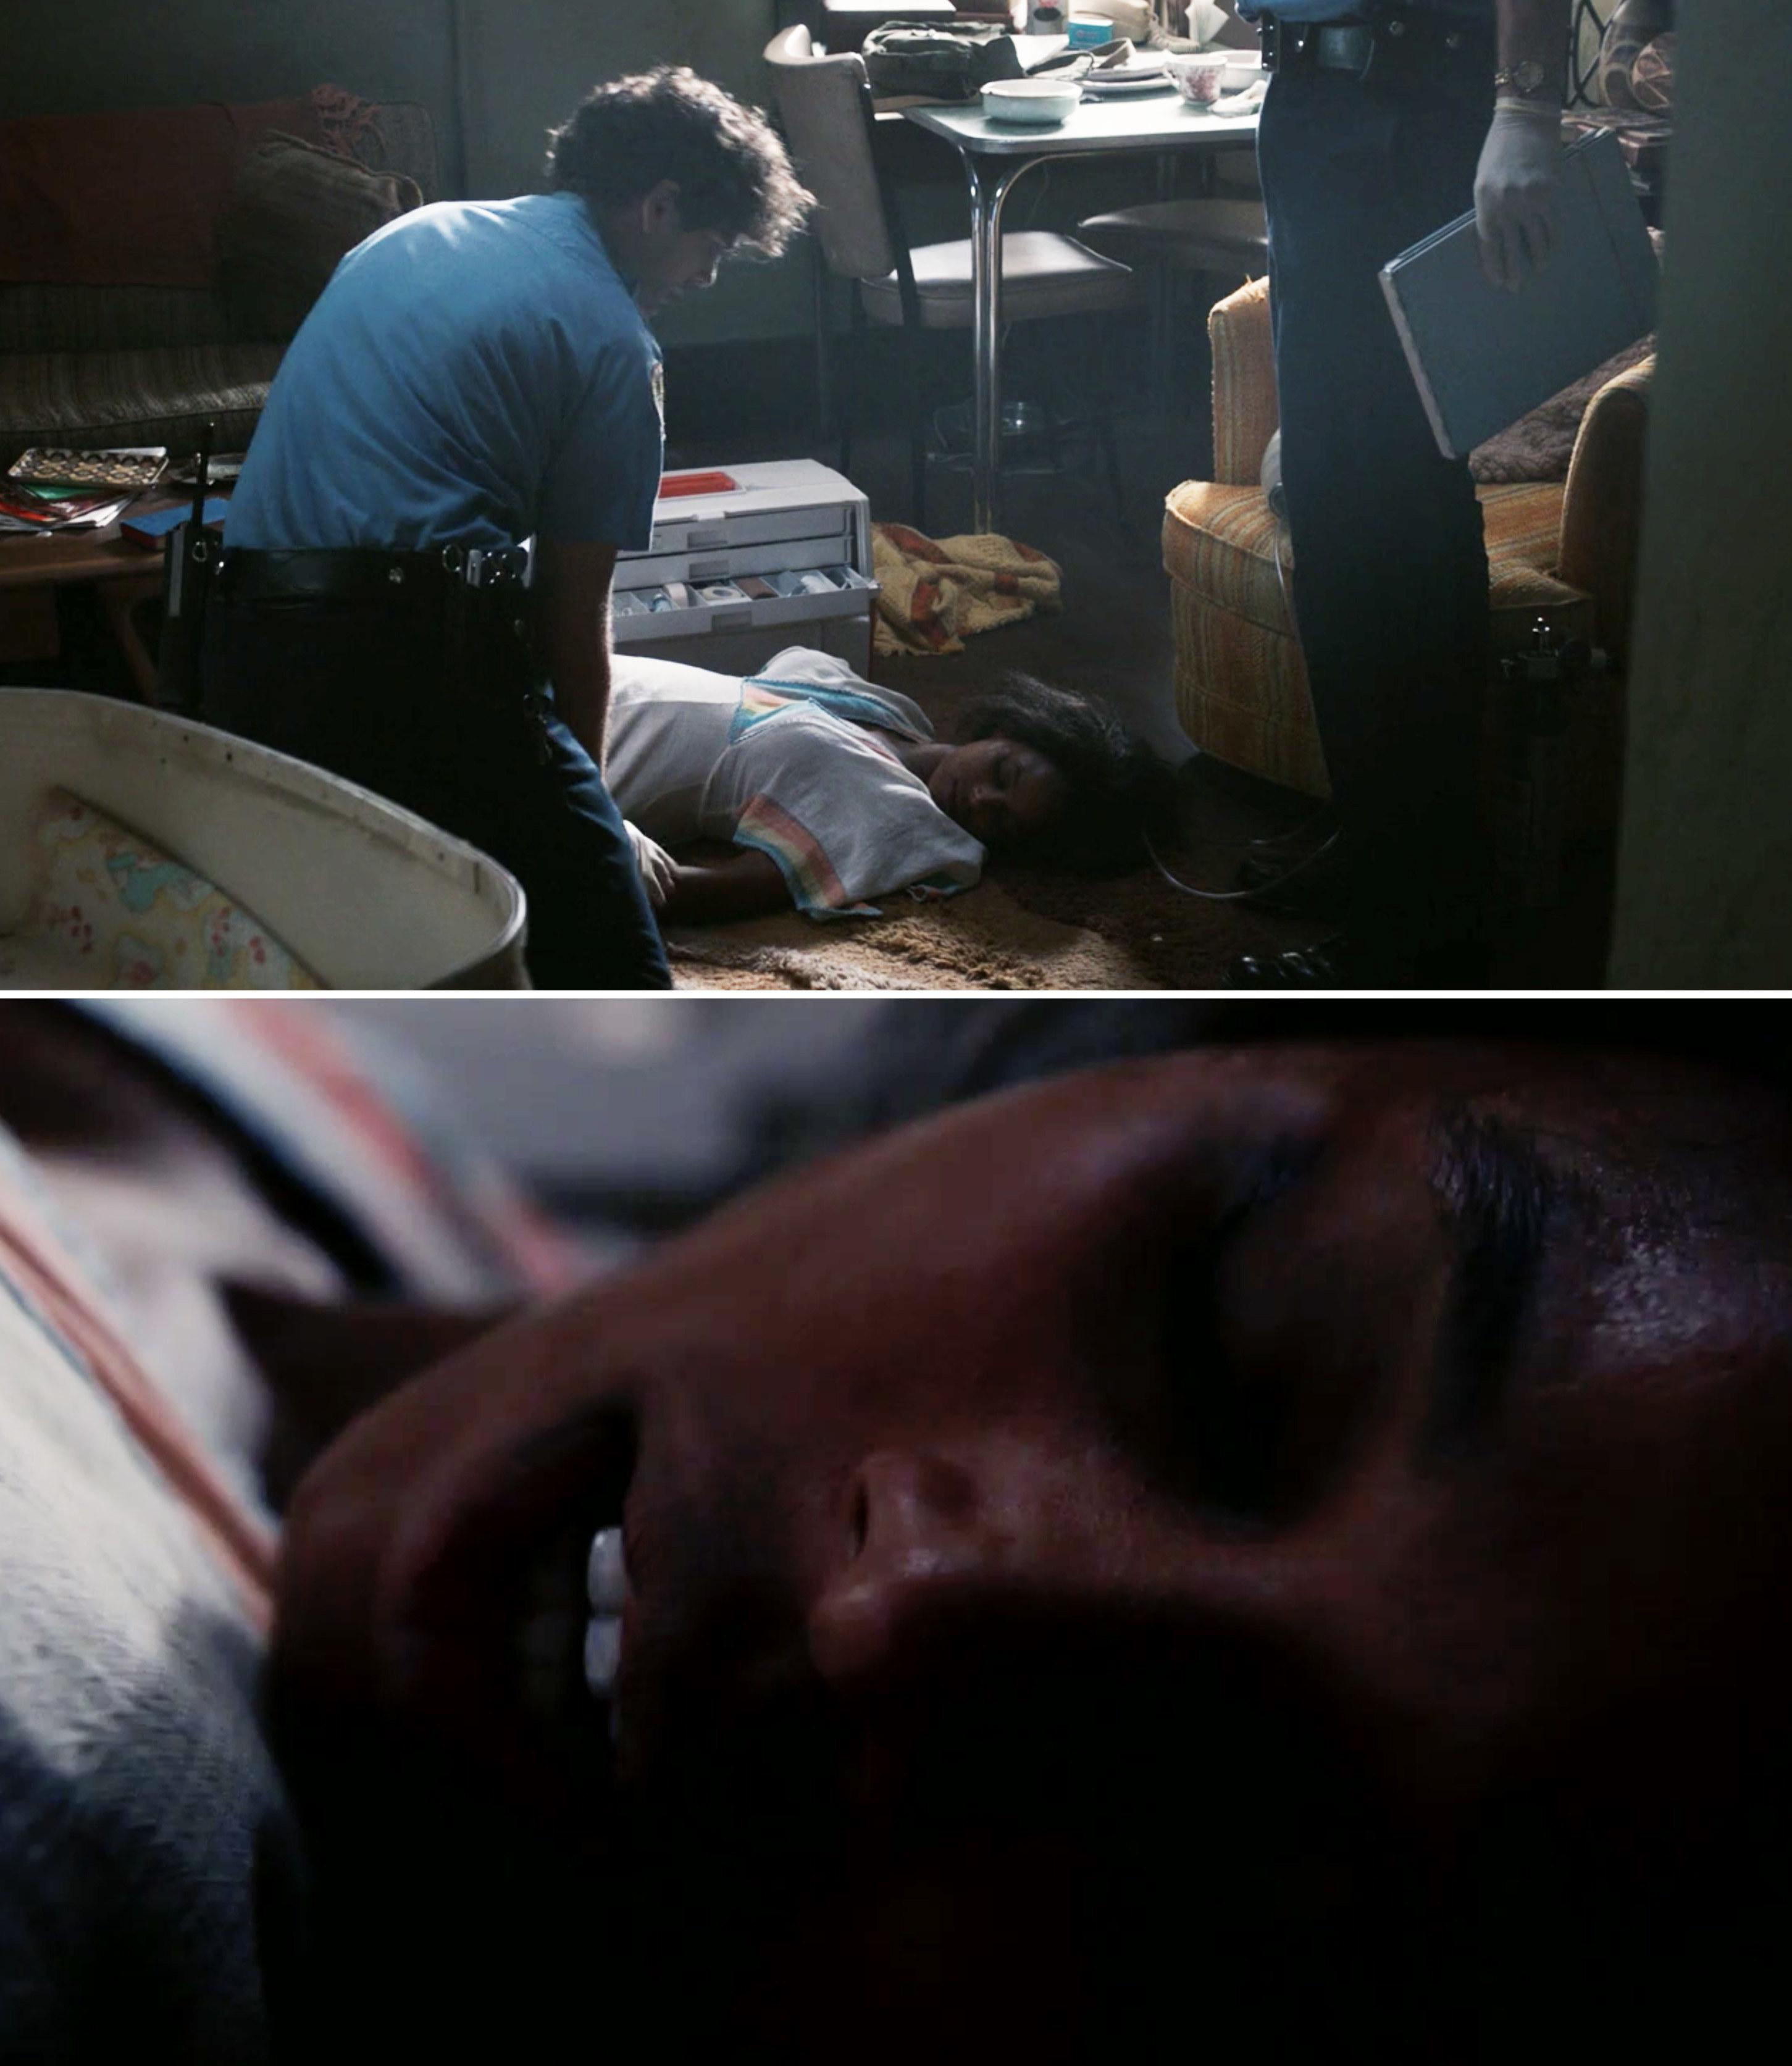 Laurel being helped by EMTs and breathing again